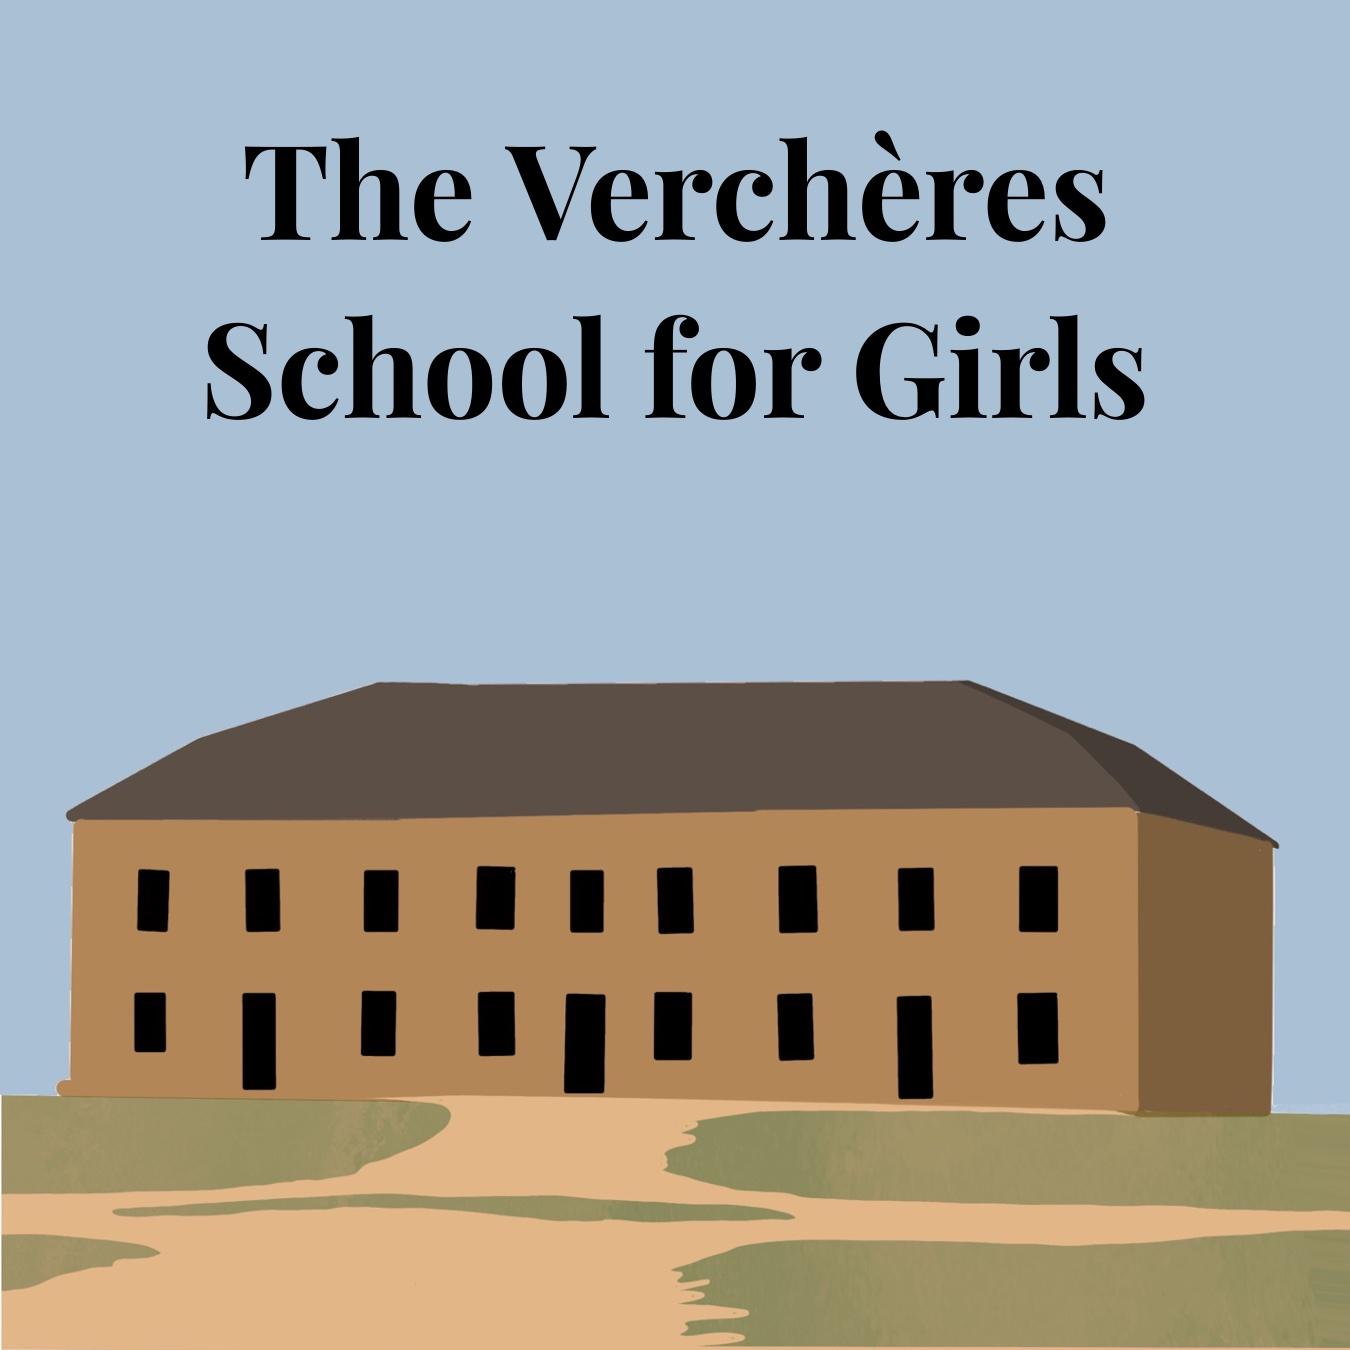 The Verchères School for Girls